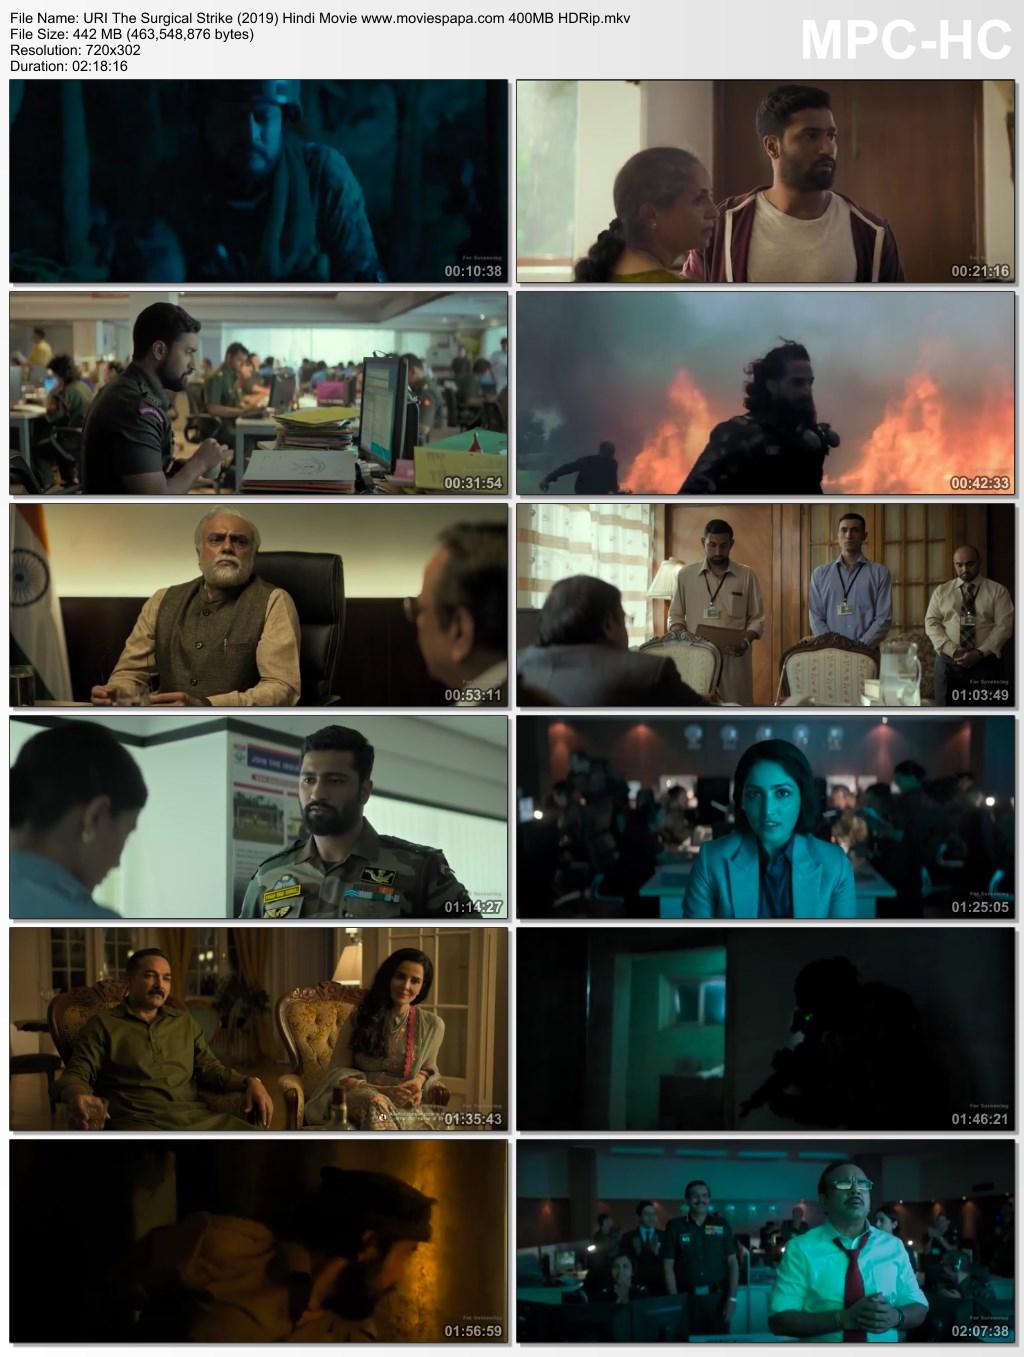 hindi movie download torrent file